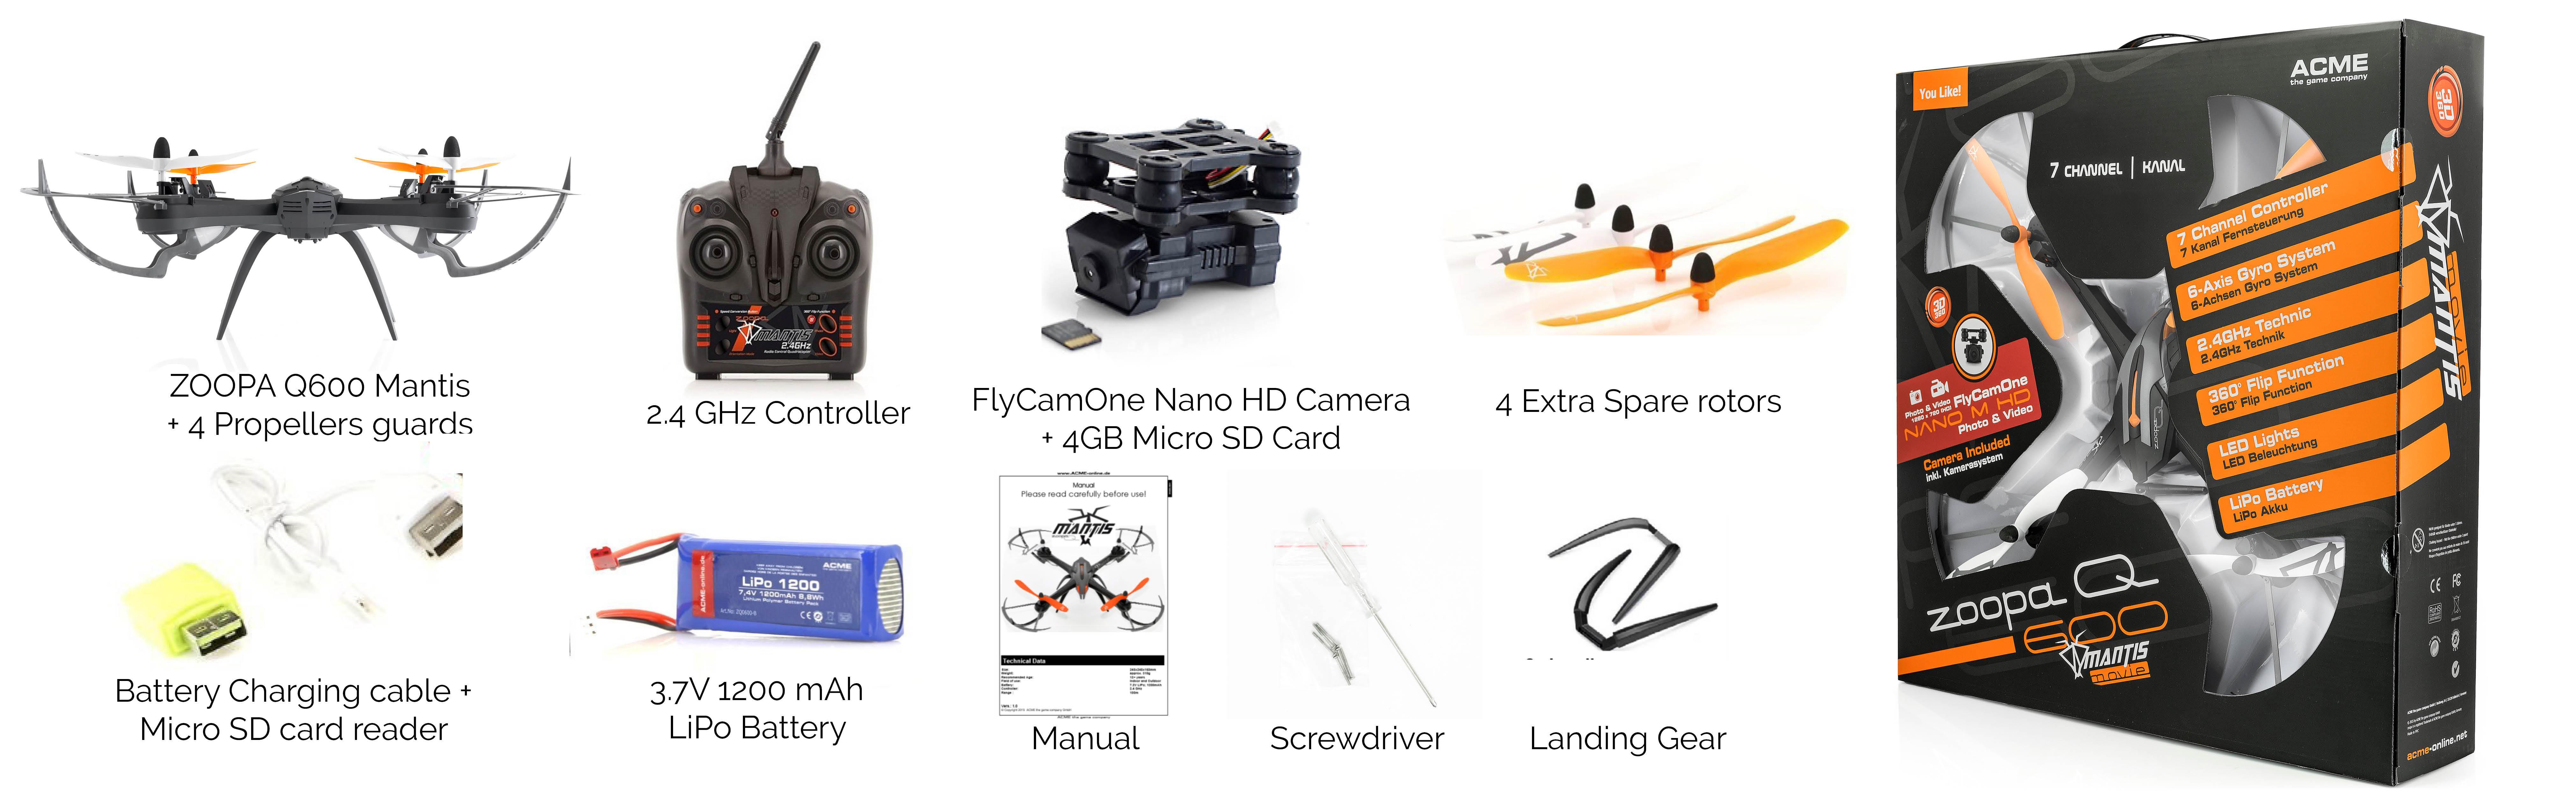 ACME Drone zoopa Q600 Mantis Quadrocopter 360° Flip LED 2.4GHz 4+3-Kanal 1200mAh